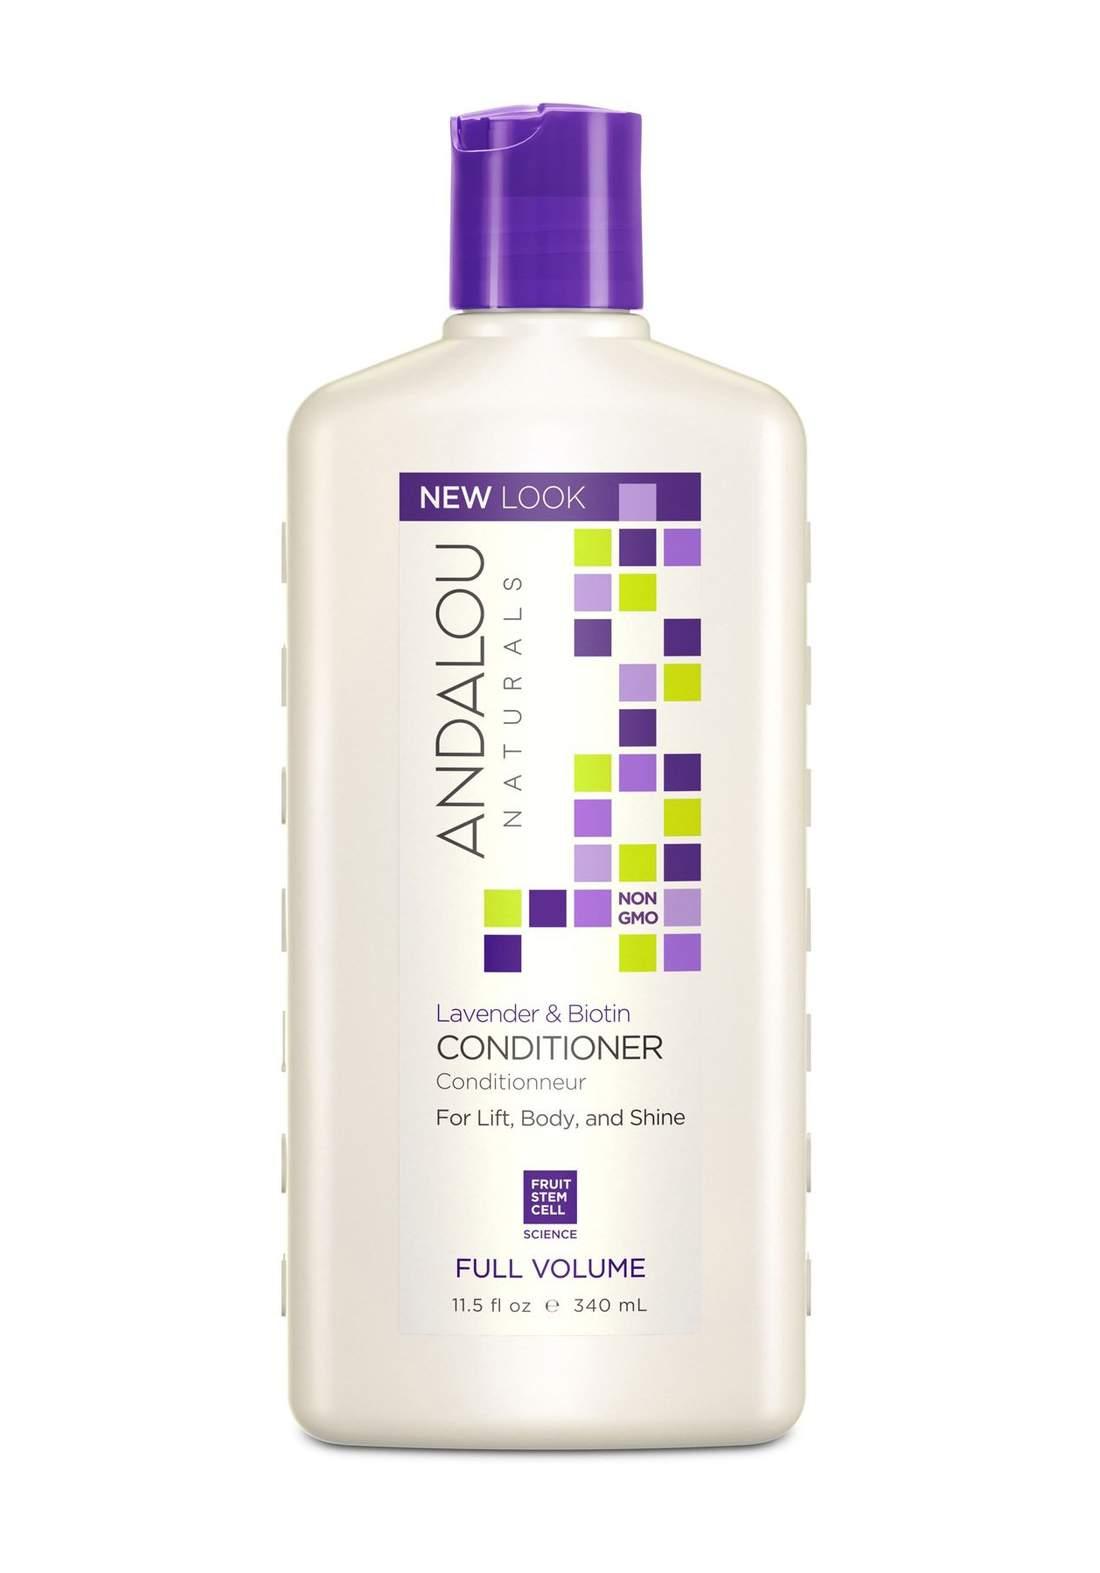 27120  Andalou Naturals Lavender Biotin Conditioner Full Volume 340ml بلسم للشعر